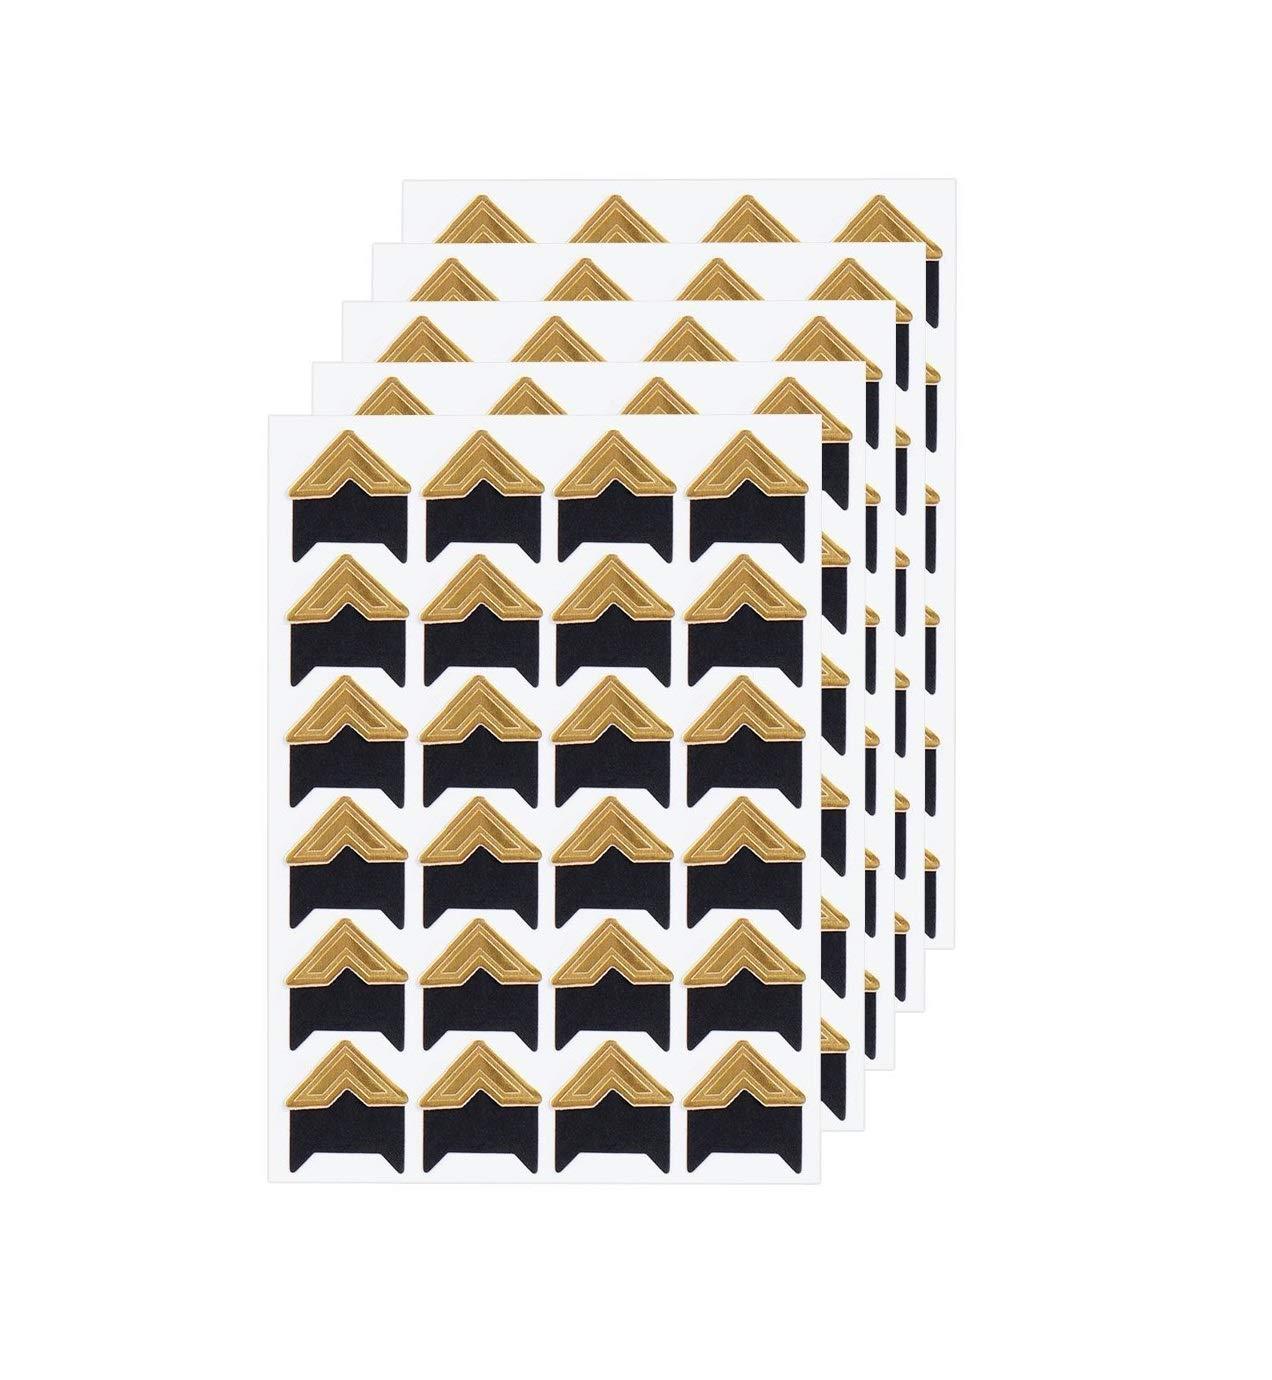 360 Count Self-Adhesive Acid Free Photo Corners for Scrapbooks Memory Books (Gold) Pulaisen 4336977538